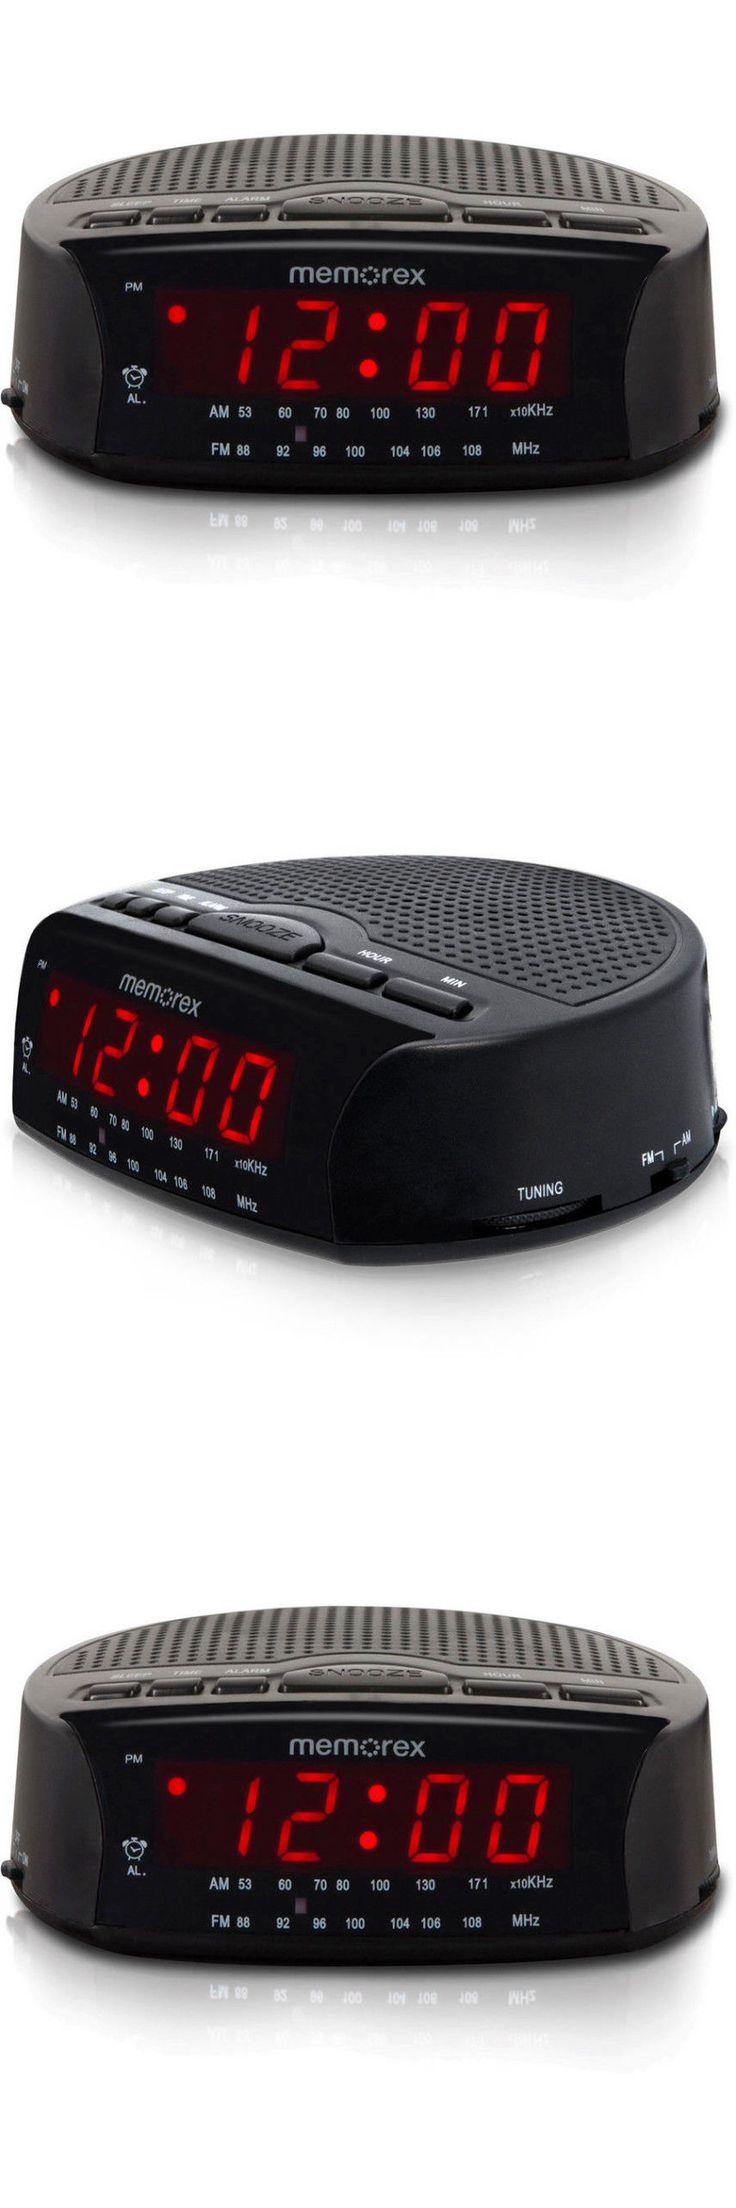 1000 digital wecker pinterest digital clocks and clock radios memorex am fm radio alarm clock electric digital red led fandeluxe Gallery